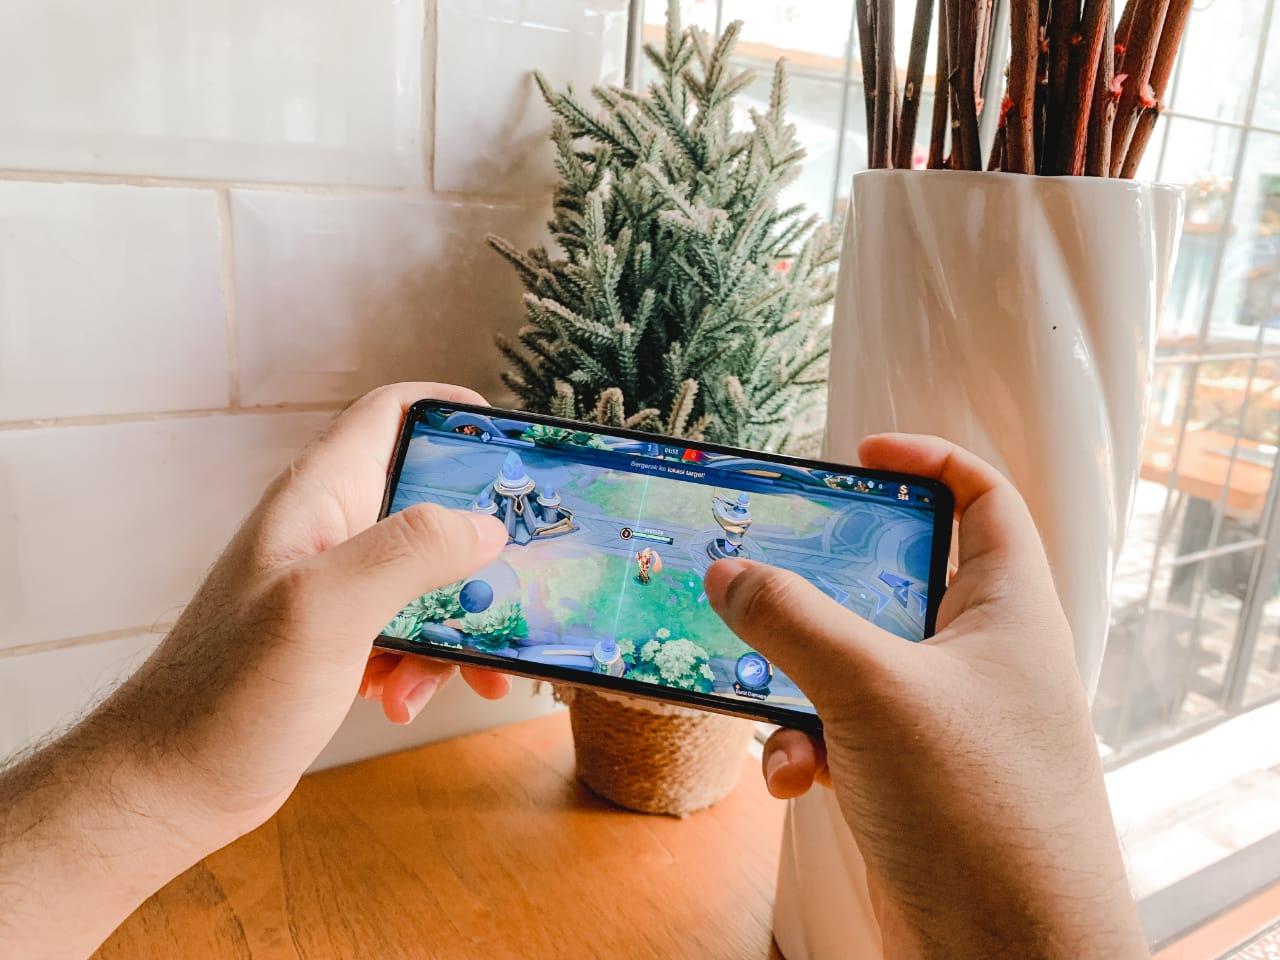 Samsung Galaxy A52s 5G ditenagai prosesor Snapdragon 778G dengan peningkatan performance hingga 80% GPU, 40% Single CPU, dan 72% Multi CPU dari generasi pendahulunya, RAM Plus 4GB, dan 240Hz touch rate membawa para atlet e-sport untuk meraih kemenangan.